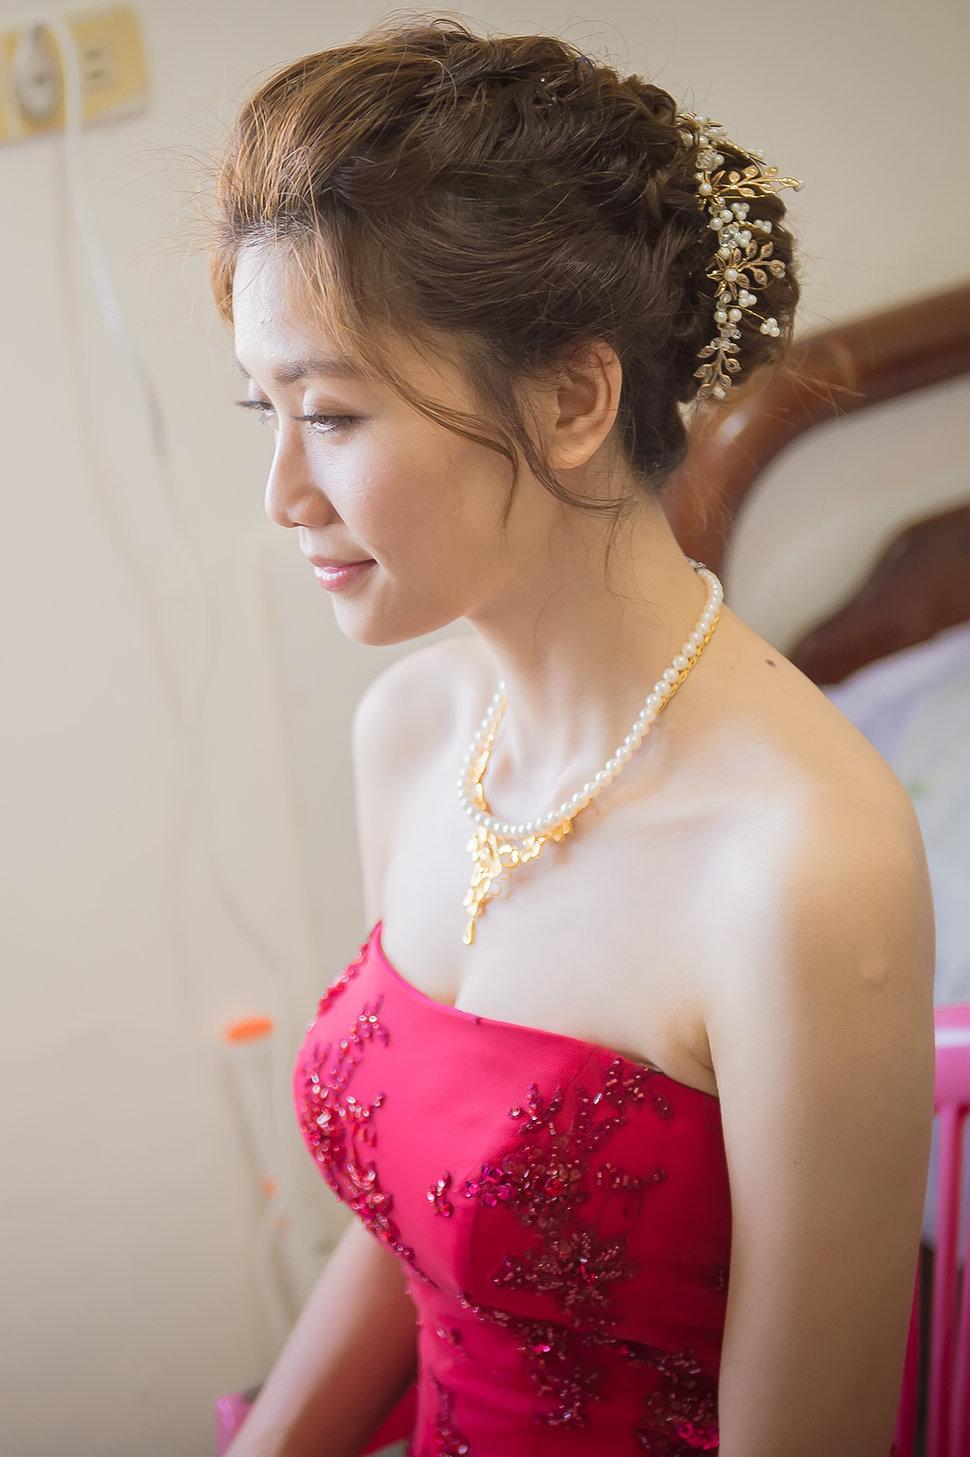 wedding-0028 - JShine攝影工作團隊 - 結婚吧